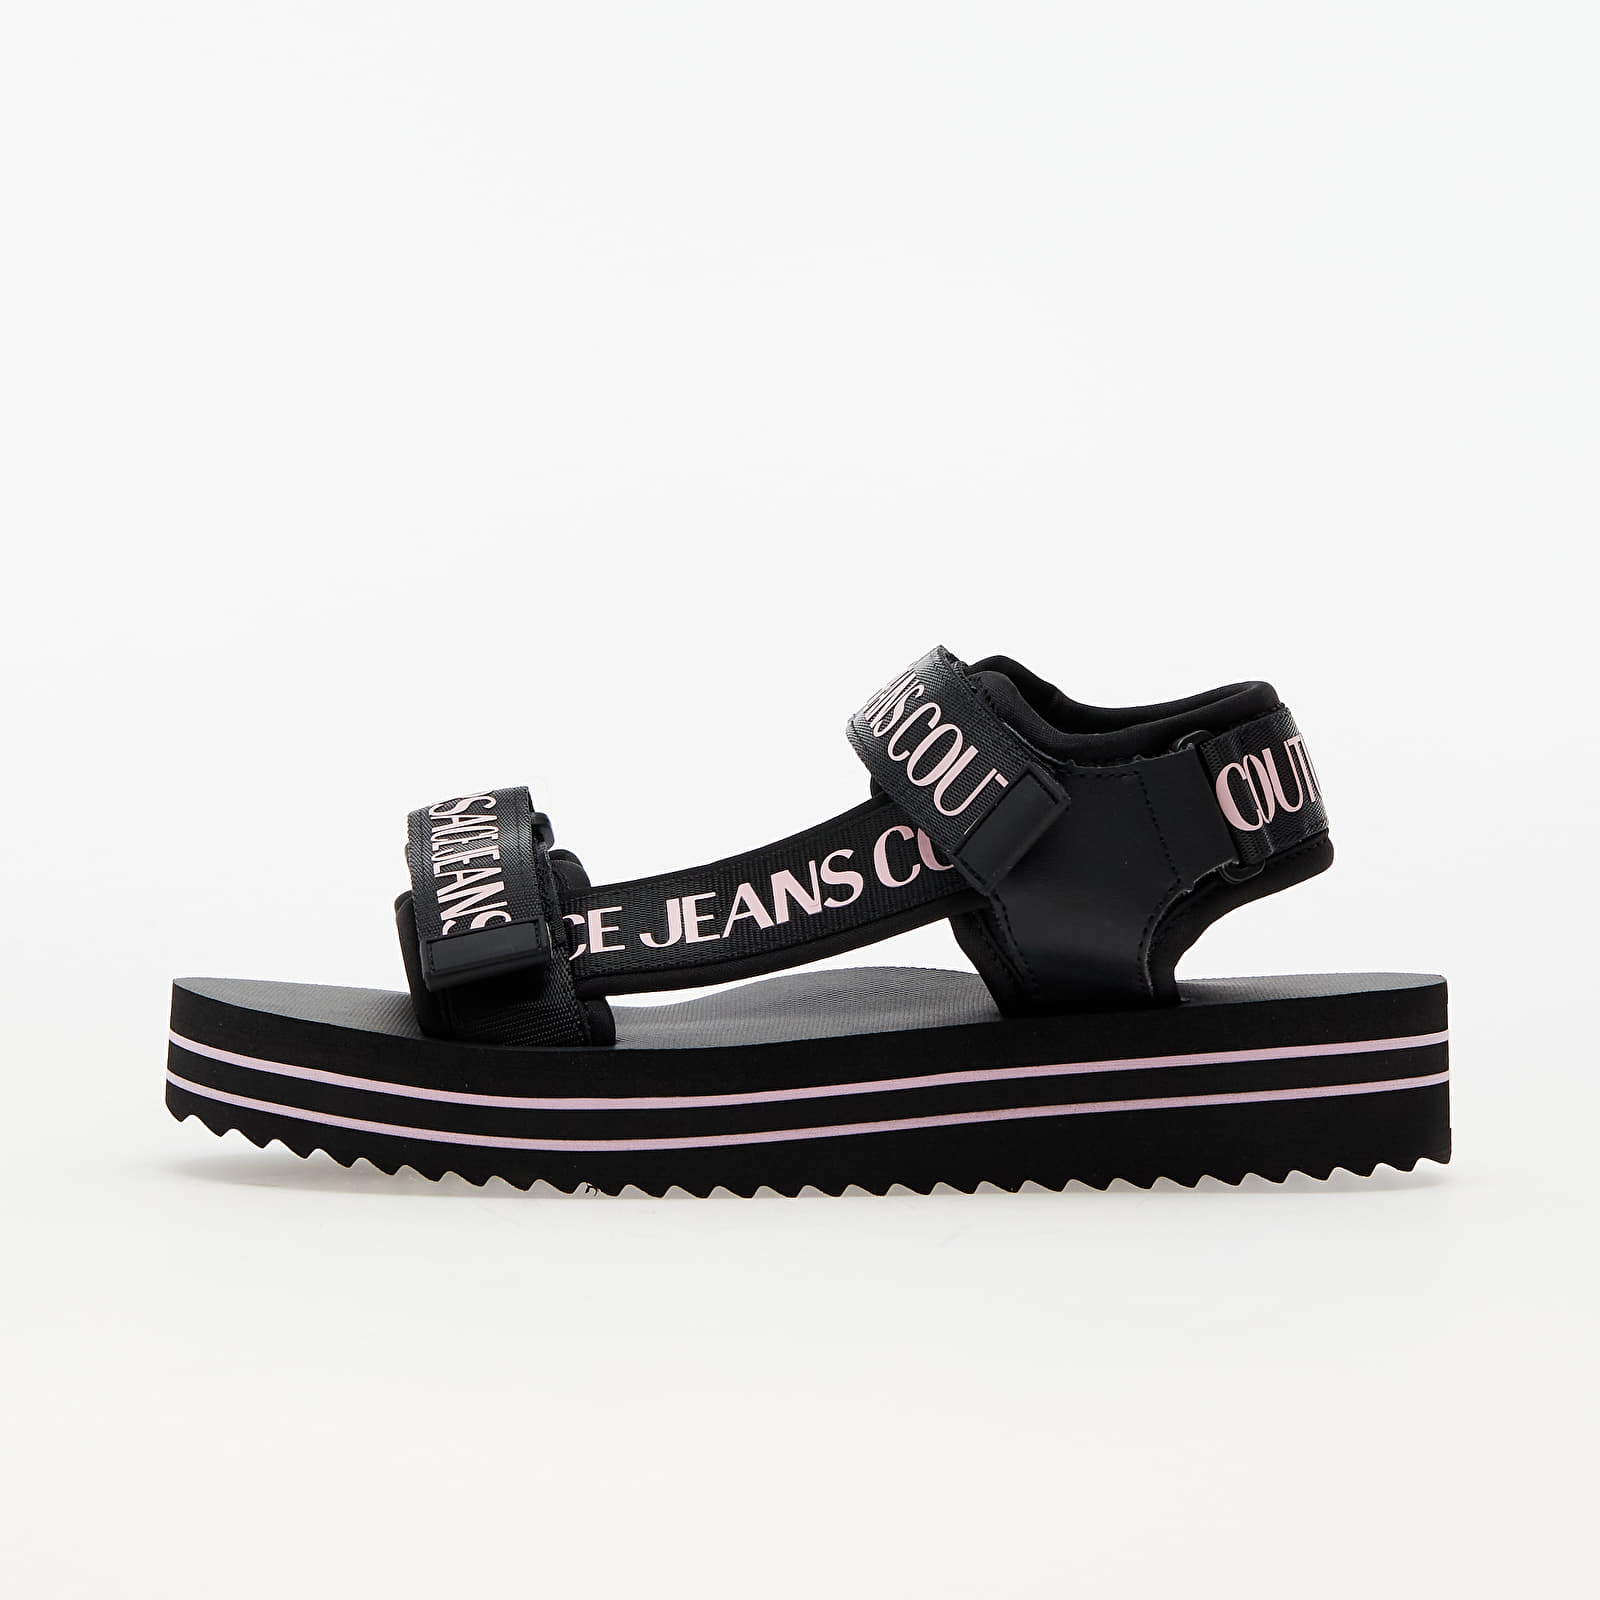 Versace Jeans Couture L. Fondo Strappy Sandal Black/ Pink 11 E0VWASX171937899